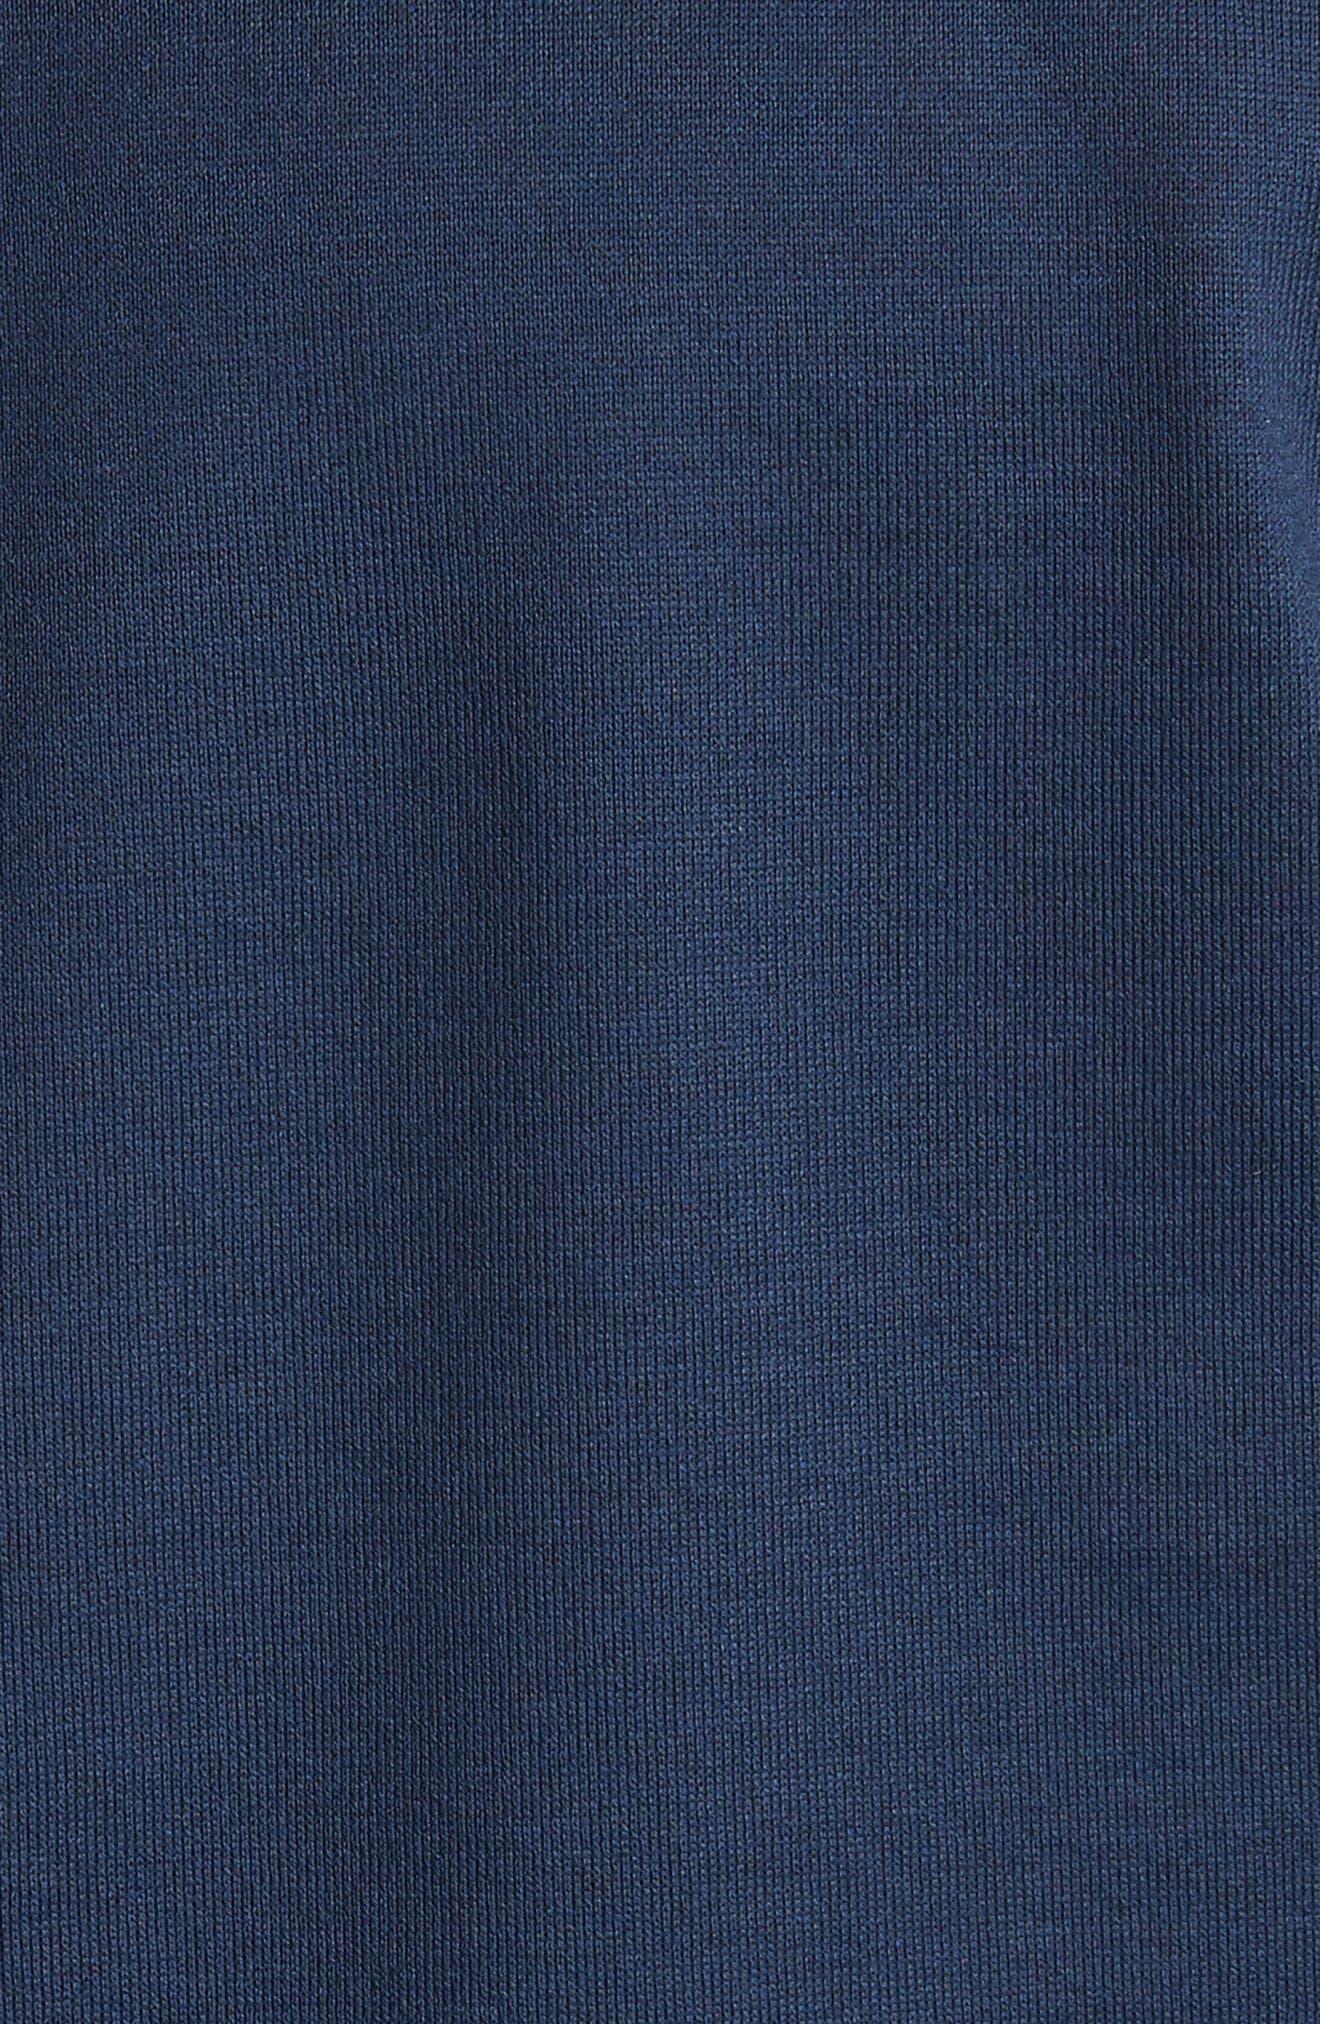 Niels N-Logo T-Shirt,                             Alternate thumbnail 5, color,